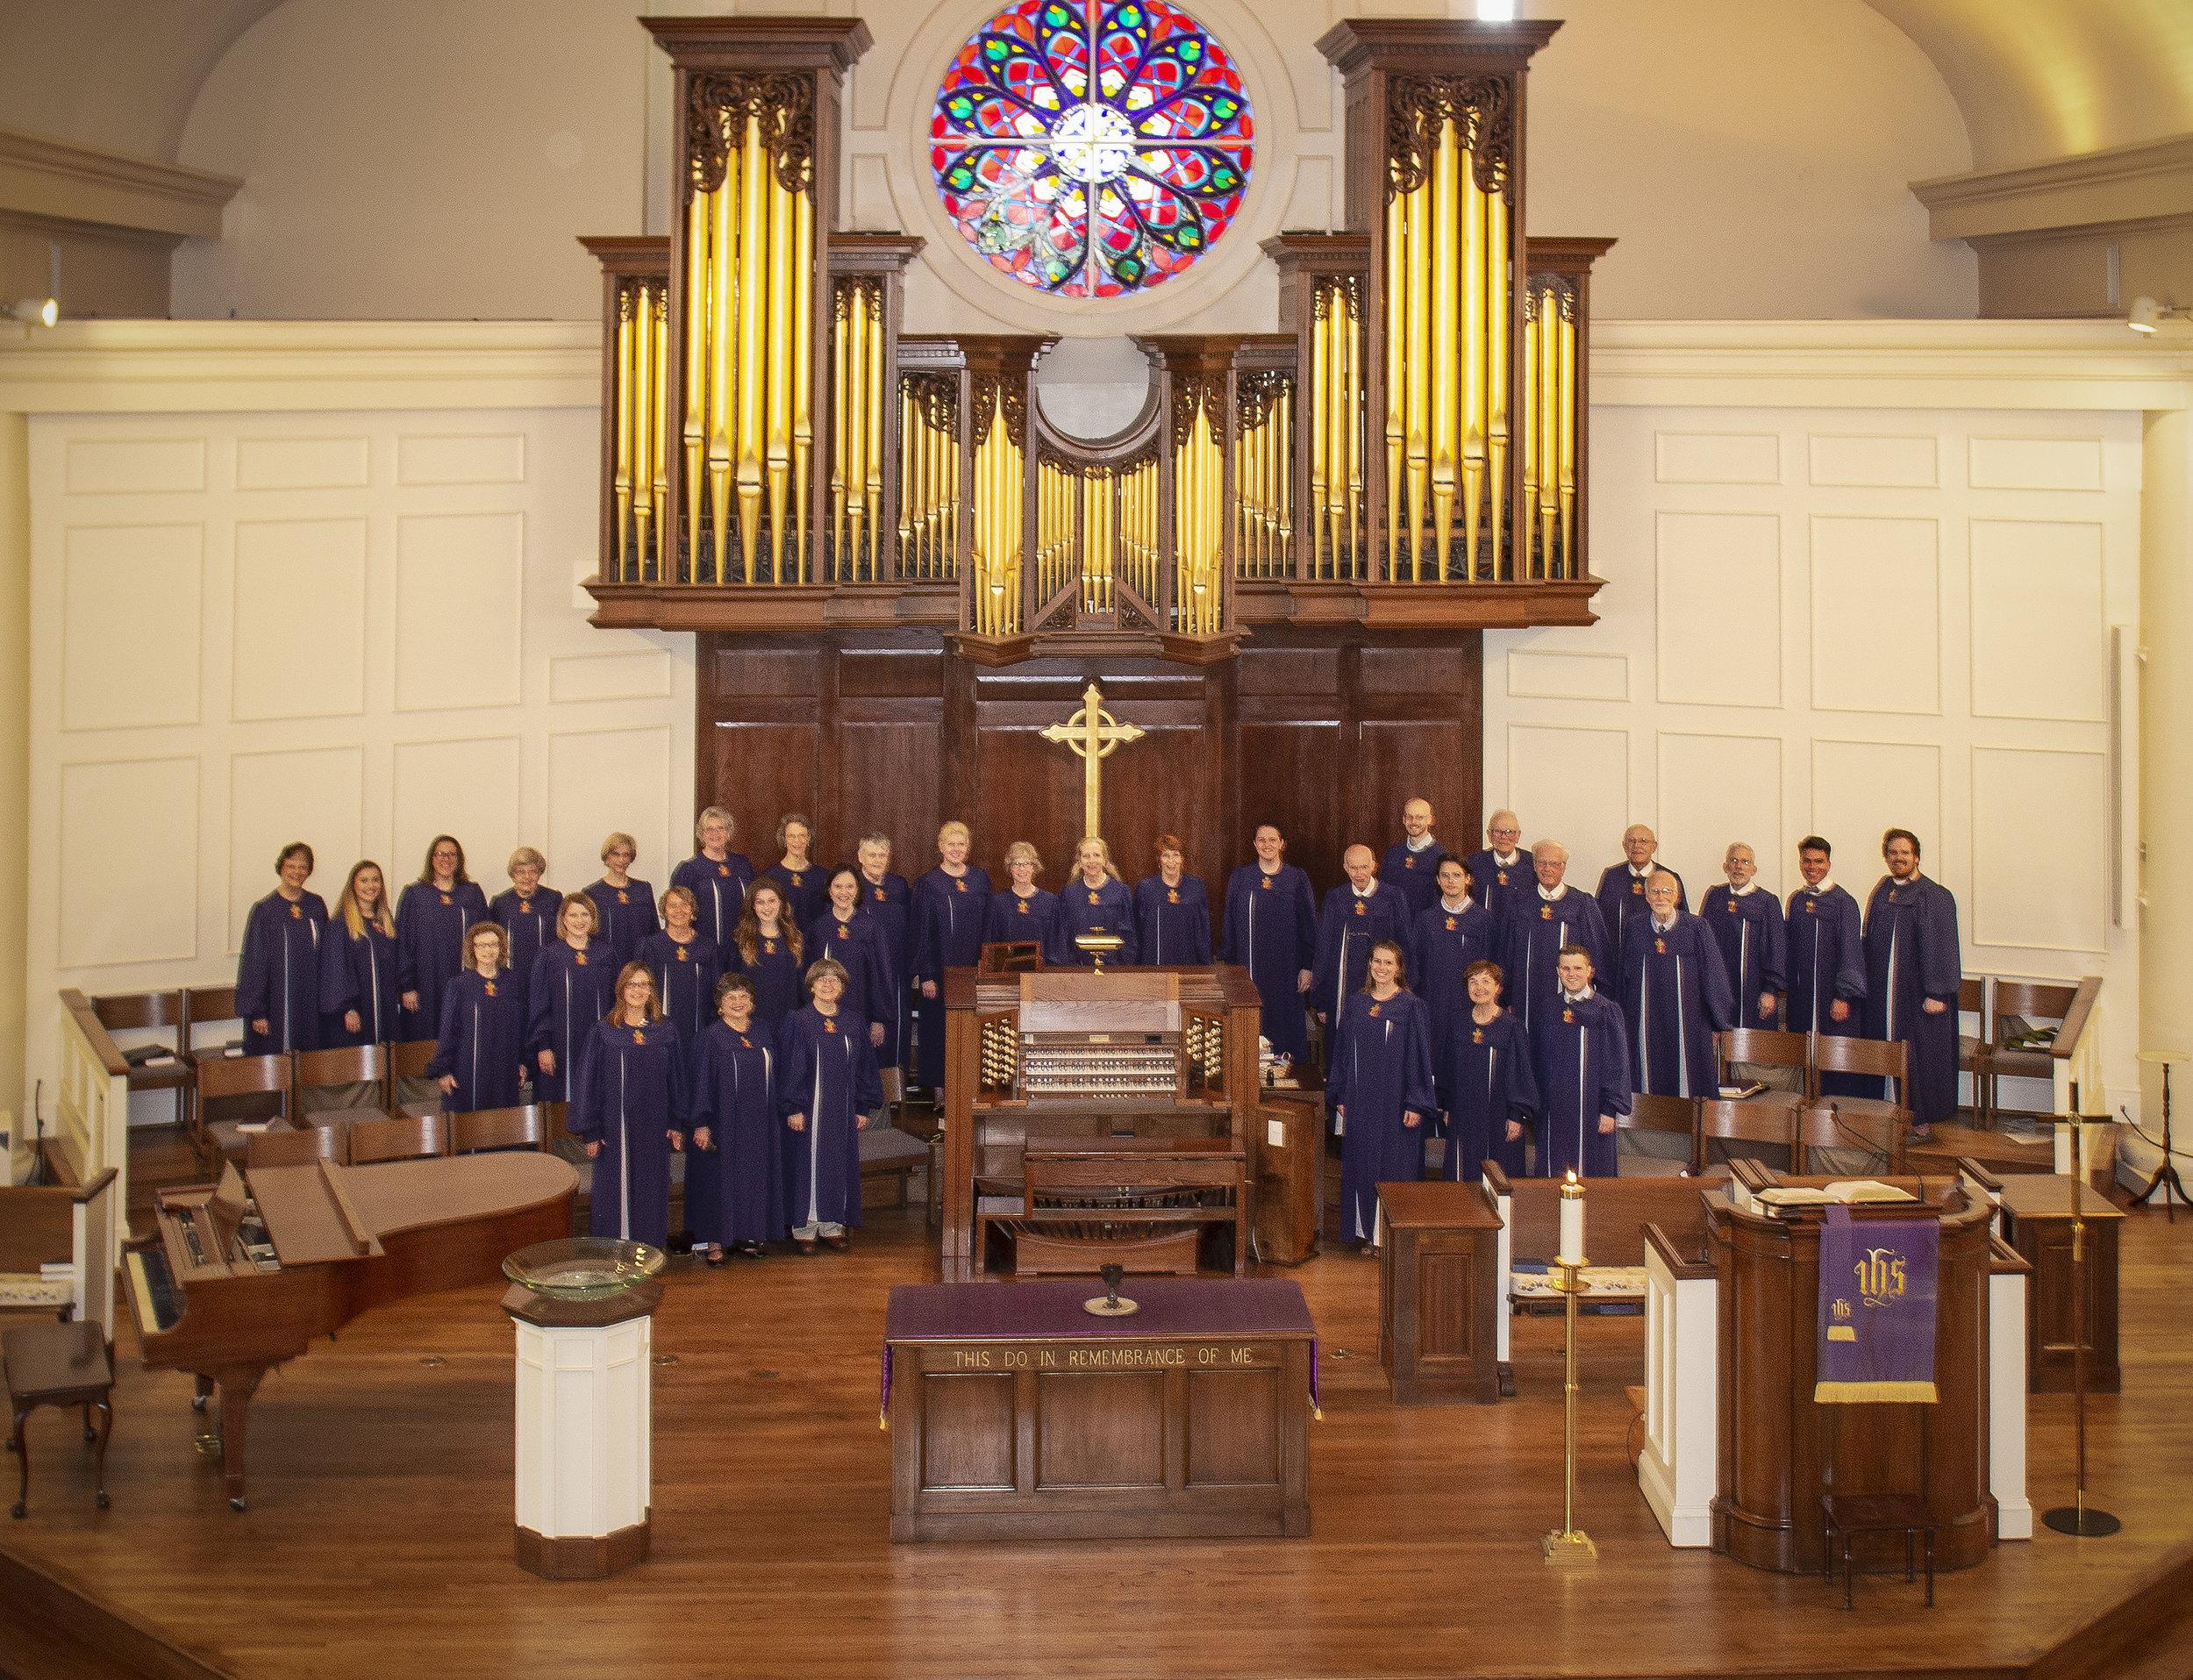 Choir_2019_1.jpg